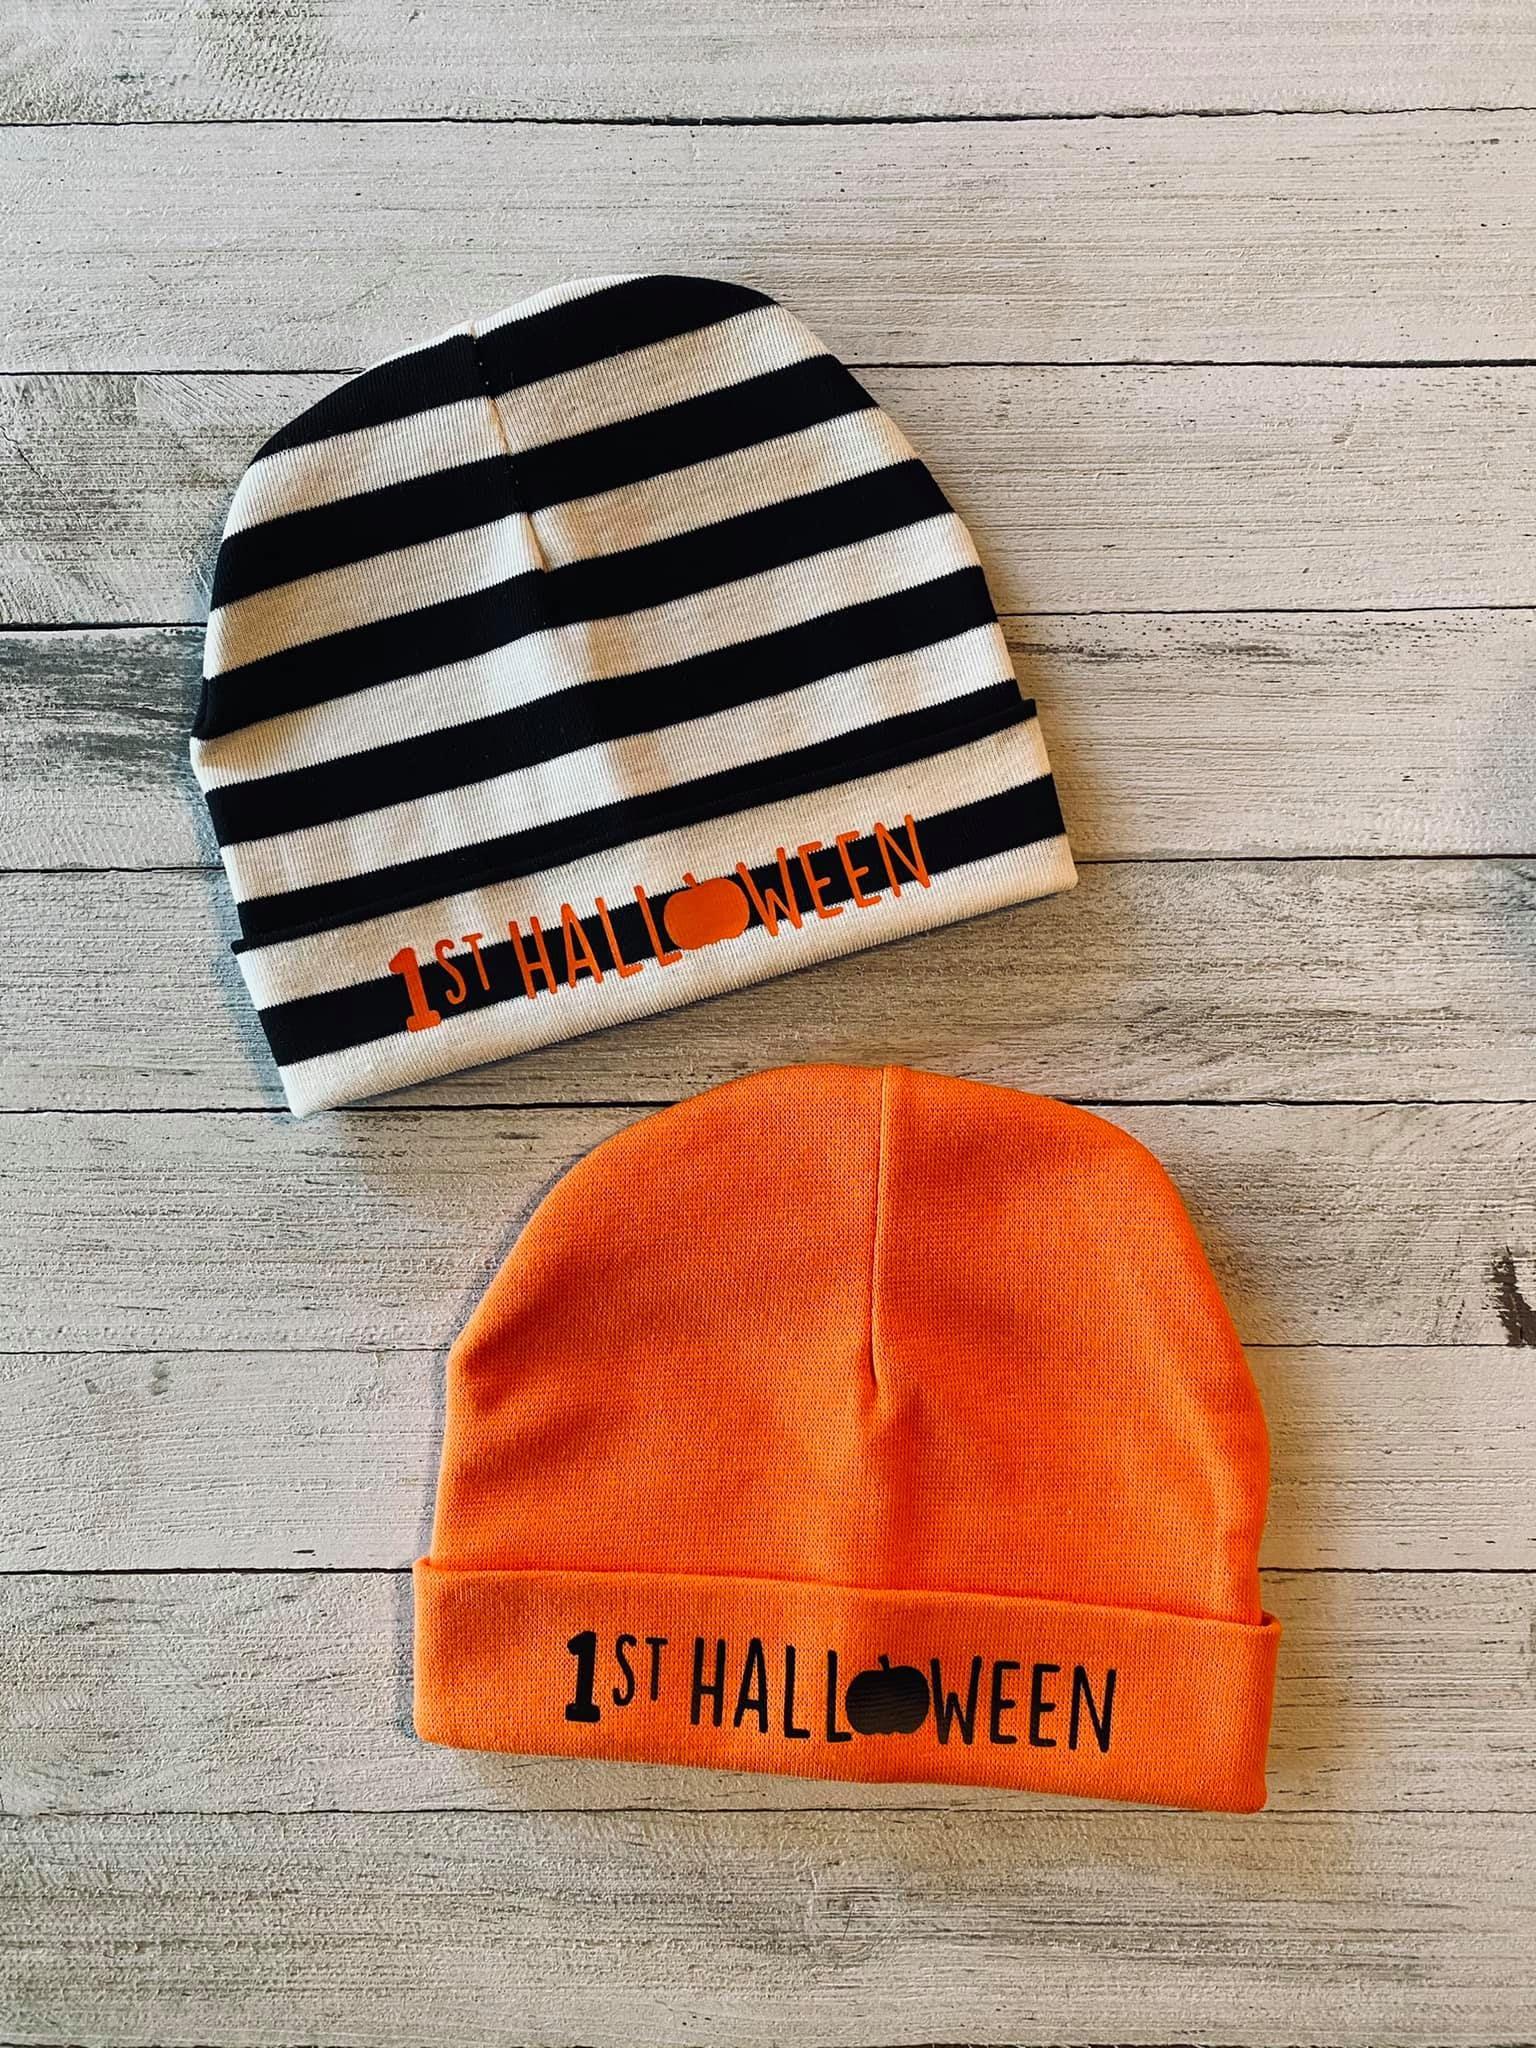 1st Halloween Baby Hat - Black and White Stripe / Silver Glitter / 1st Halloween with Pumpkin